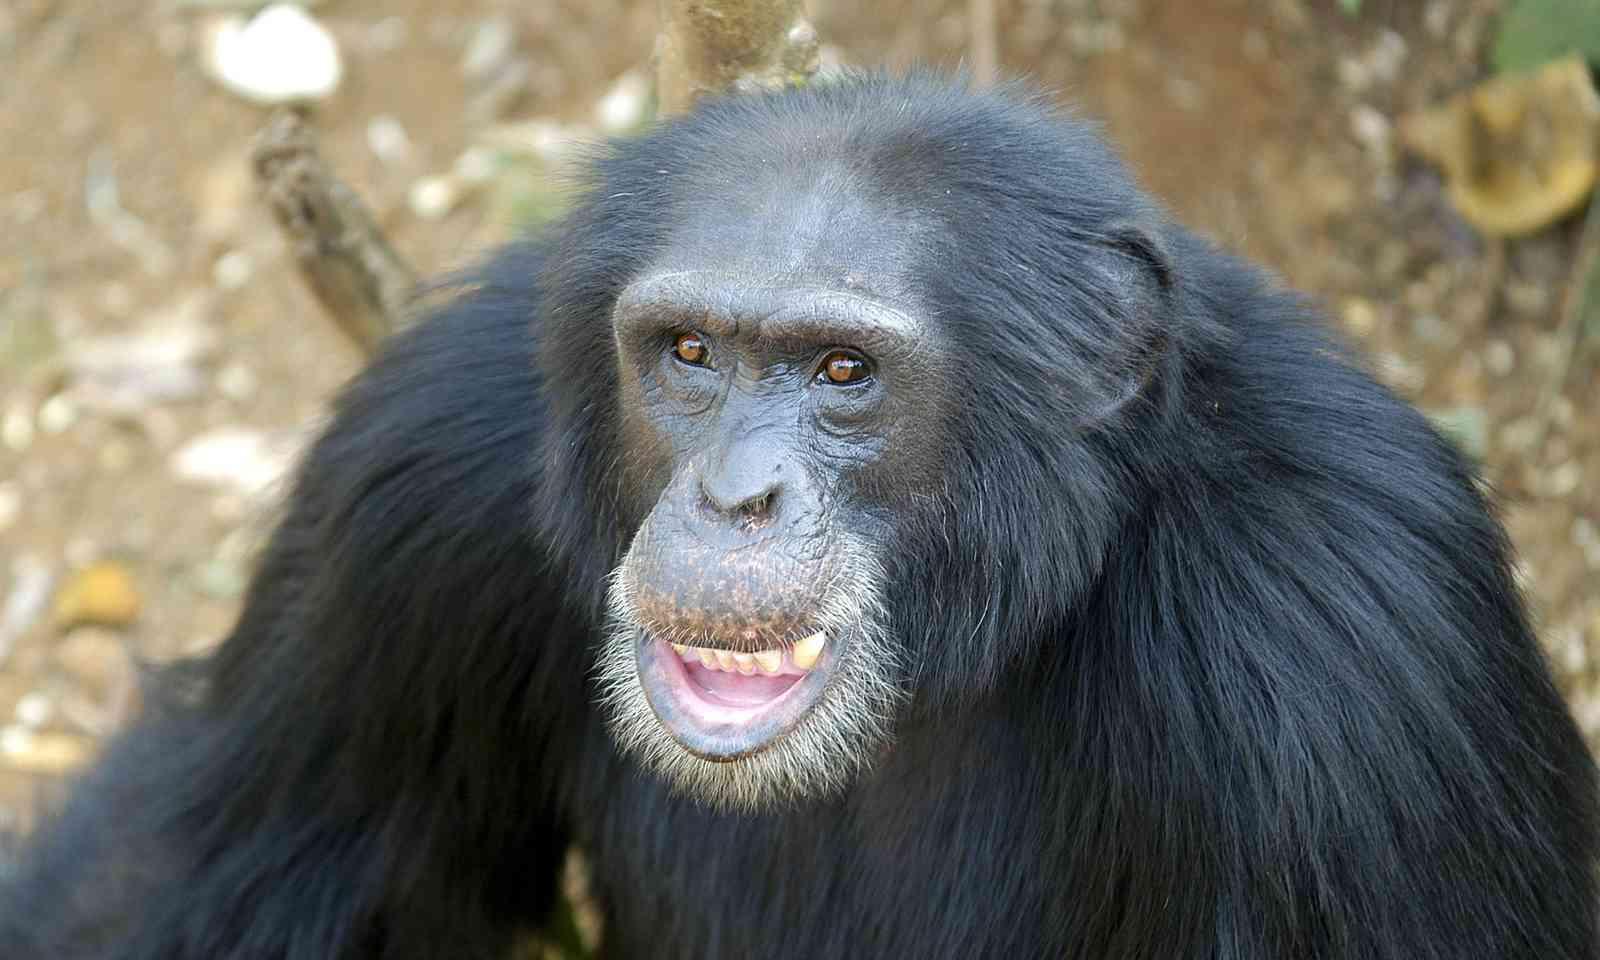 A chimpanzee in Sierra Leone (Dreamstime)